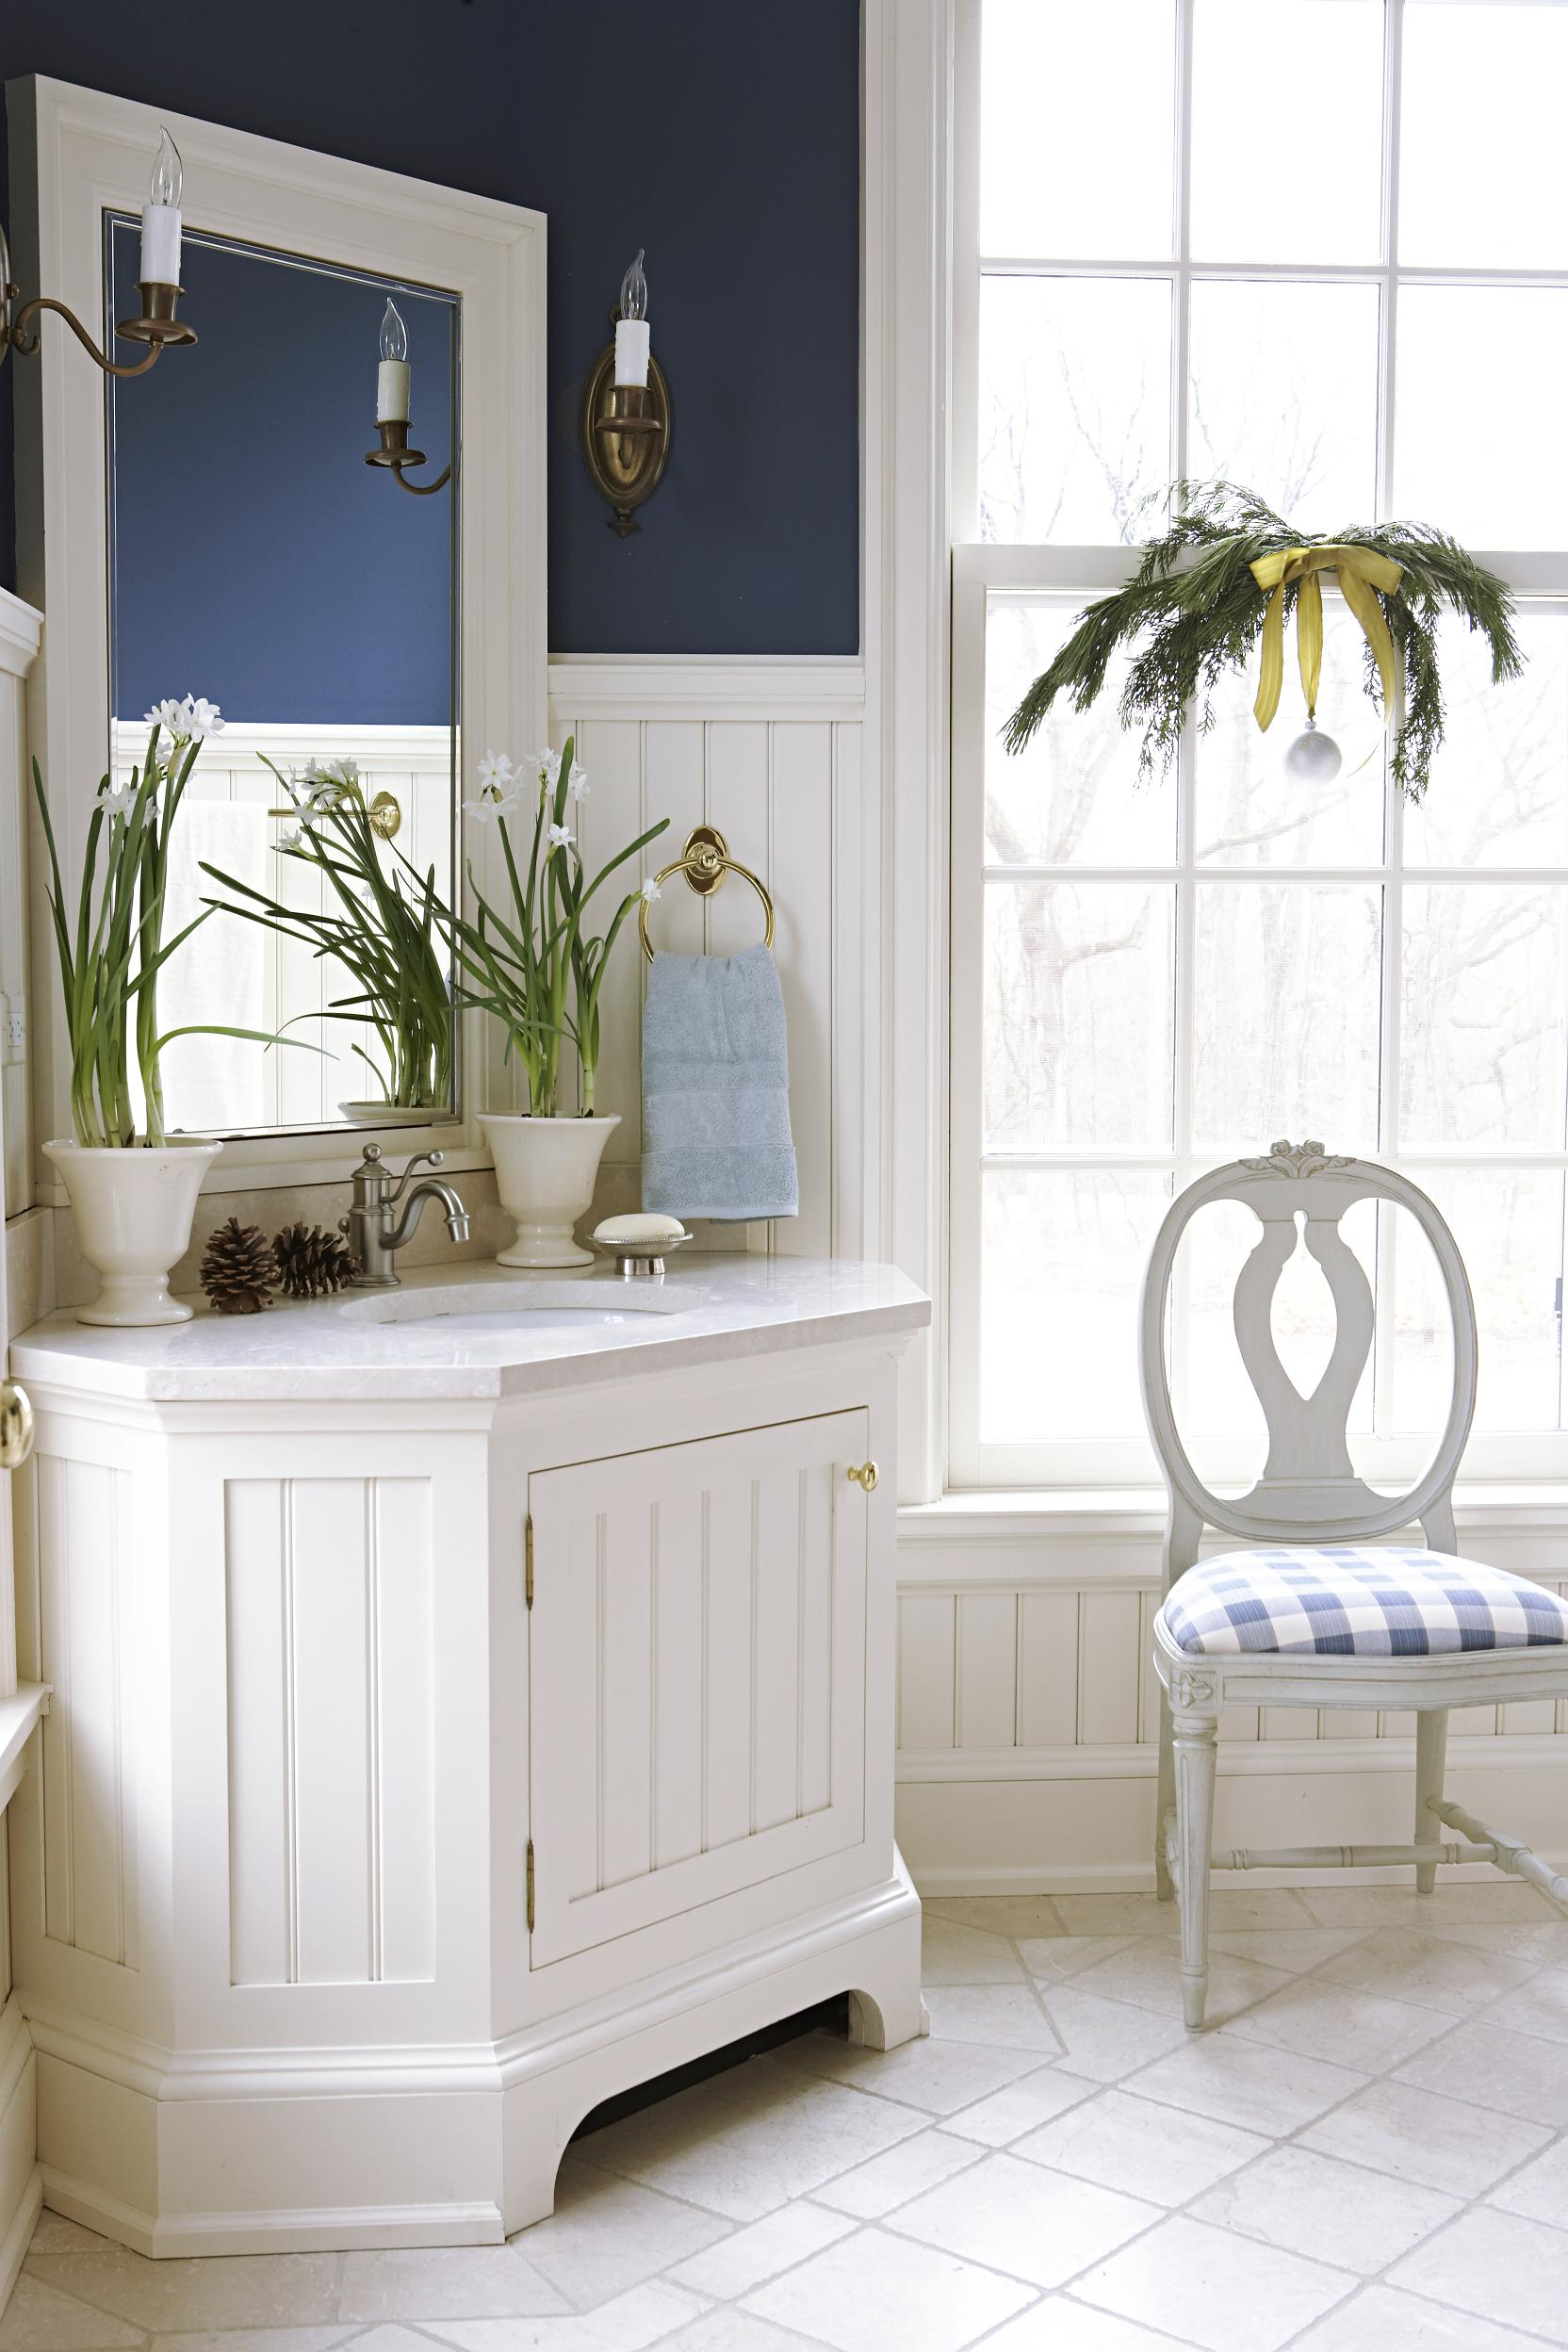 Fine bath woodwork